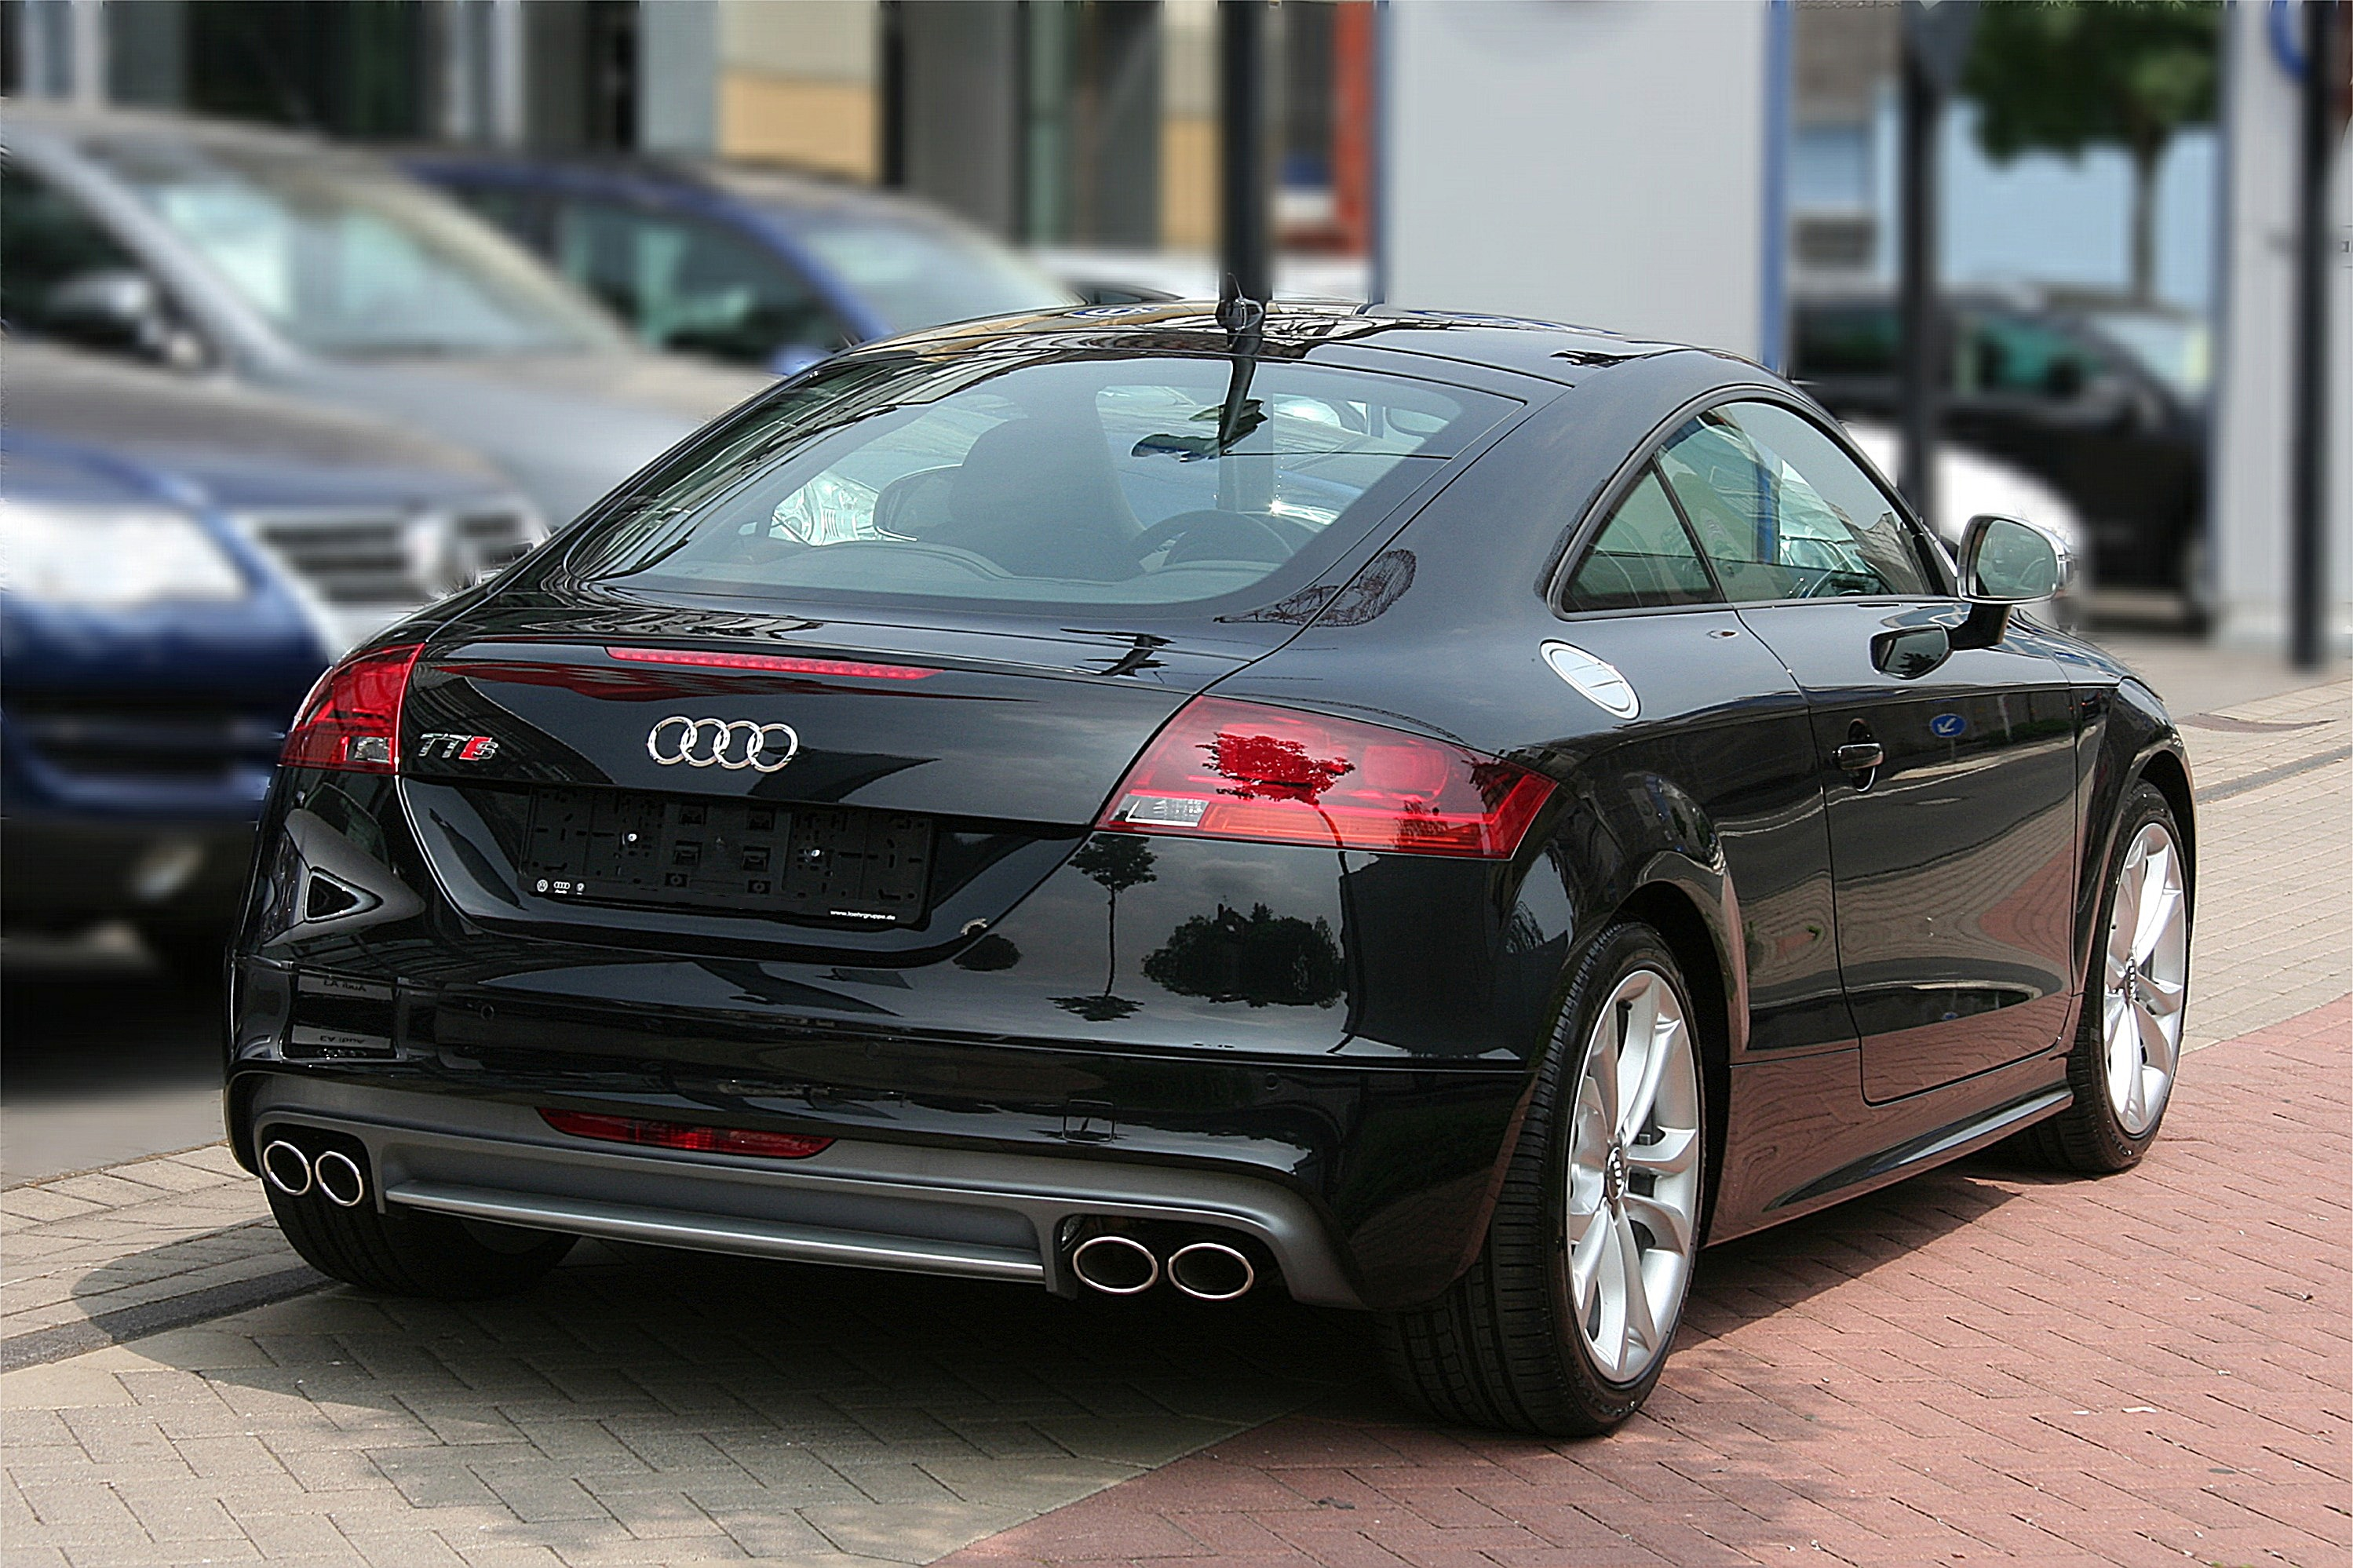 File:Audi TTS, Bj. 2008 (2008-05-29) Heck.jpg - Wikimedia ...